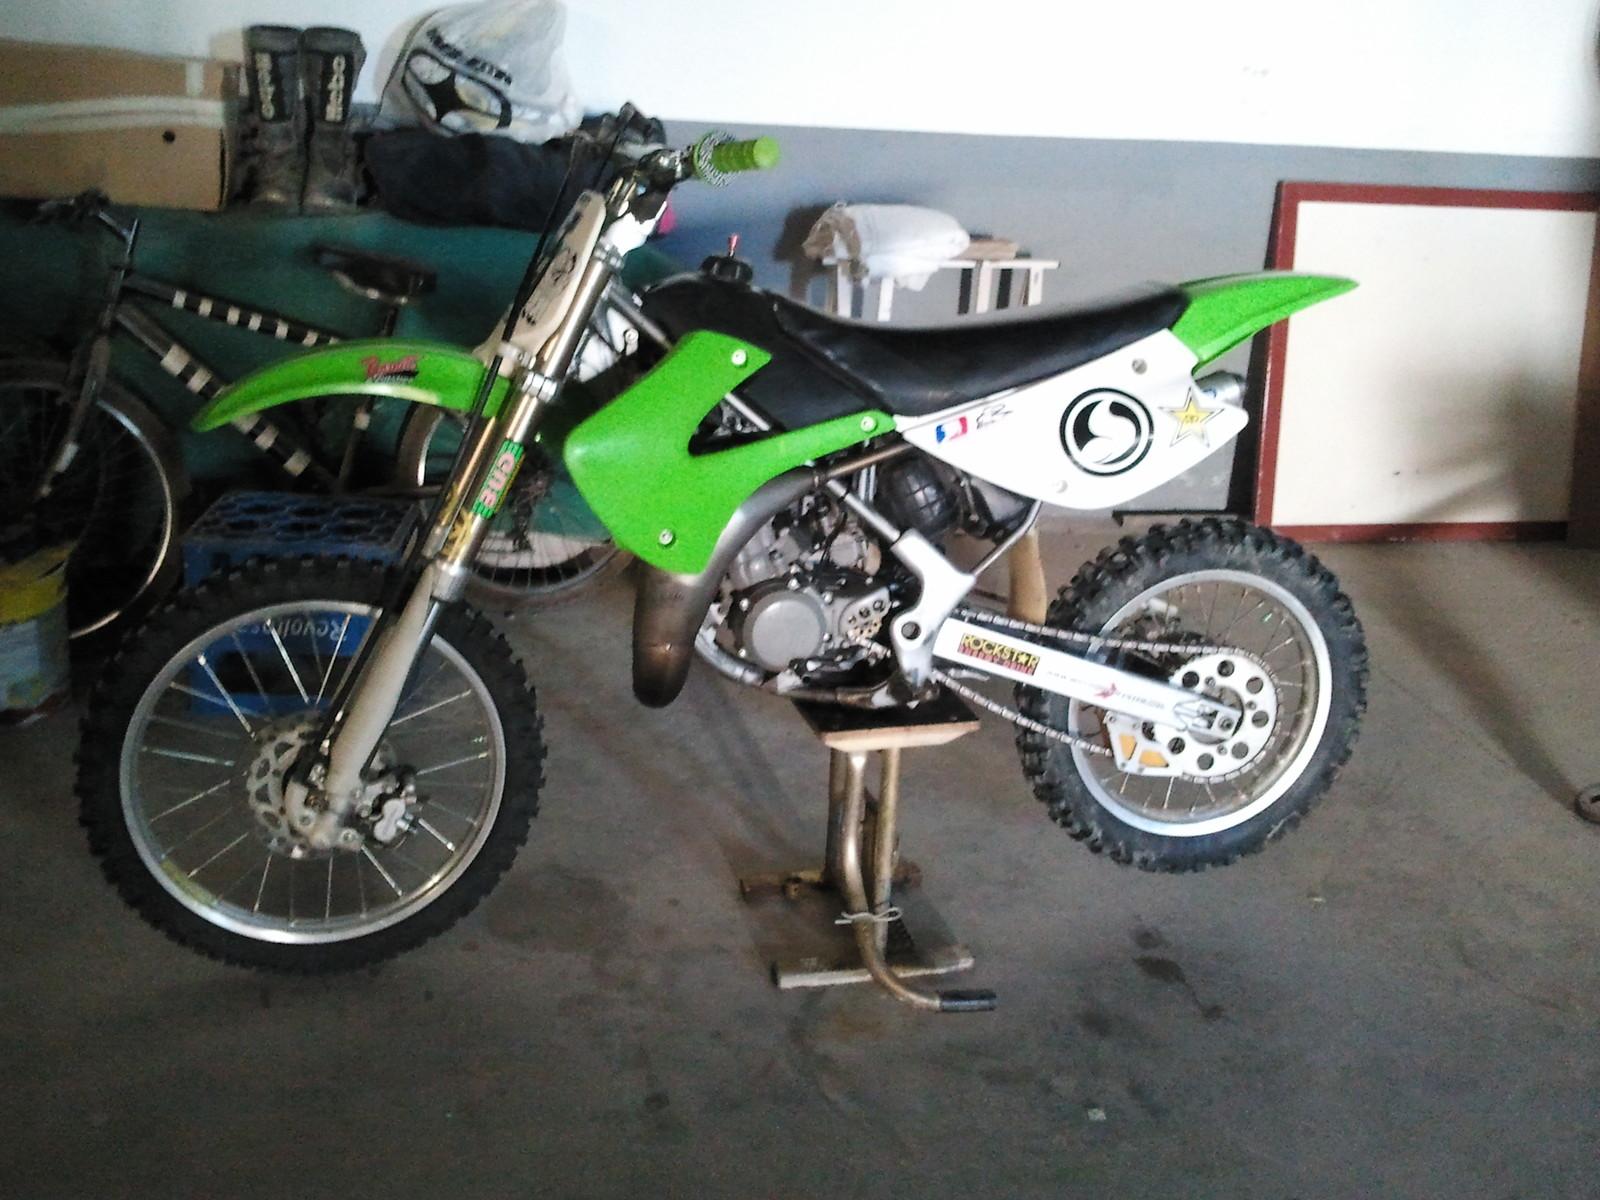 kx 85 - david.tejerosantiago - Motocross Pictures - Vital MX